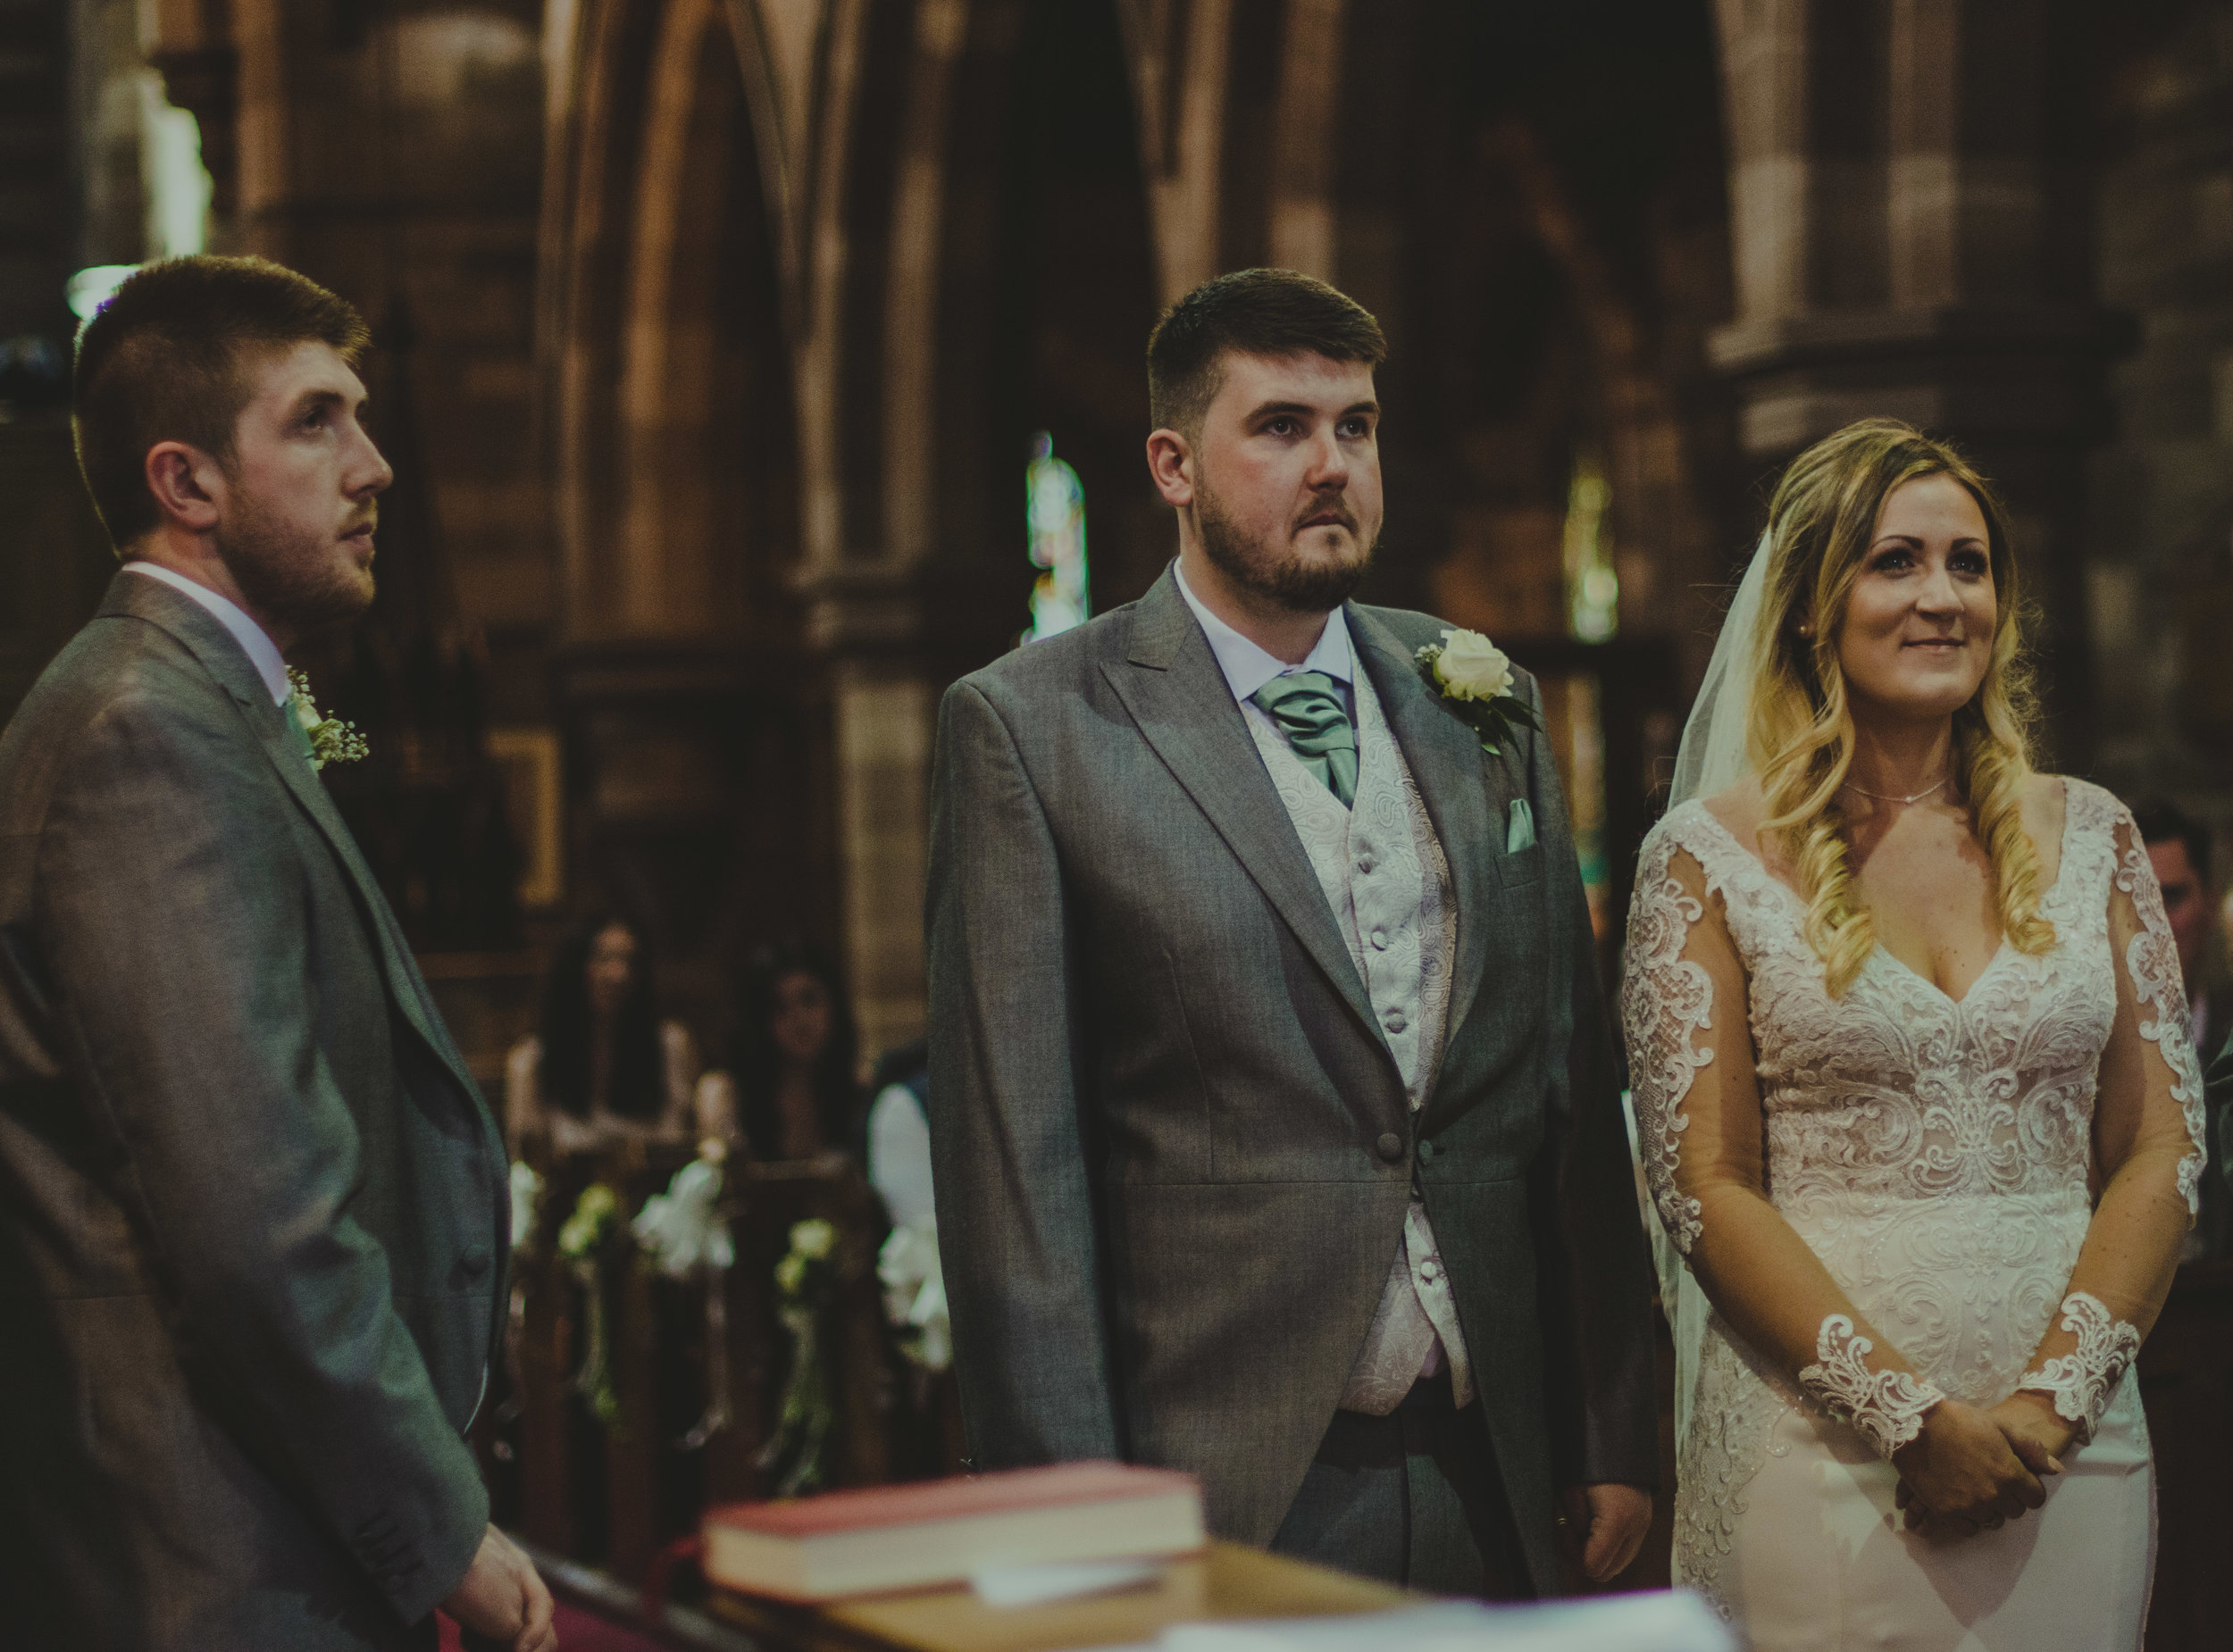 Cheshire wedding Photographer wedding photographer engagement photographer carlisle wedding photographer Glasgow wedding photographer lancashire wedding photographer (1 of 1)-5.jpg